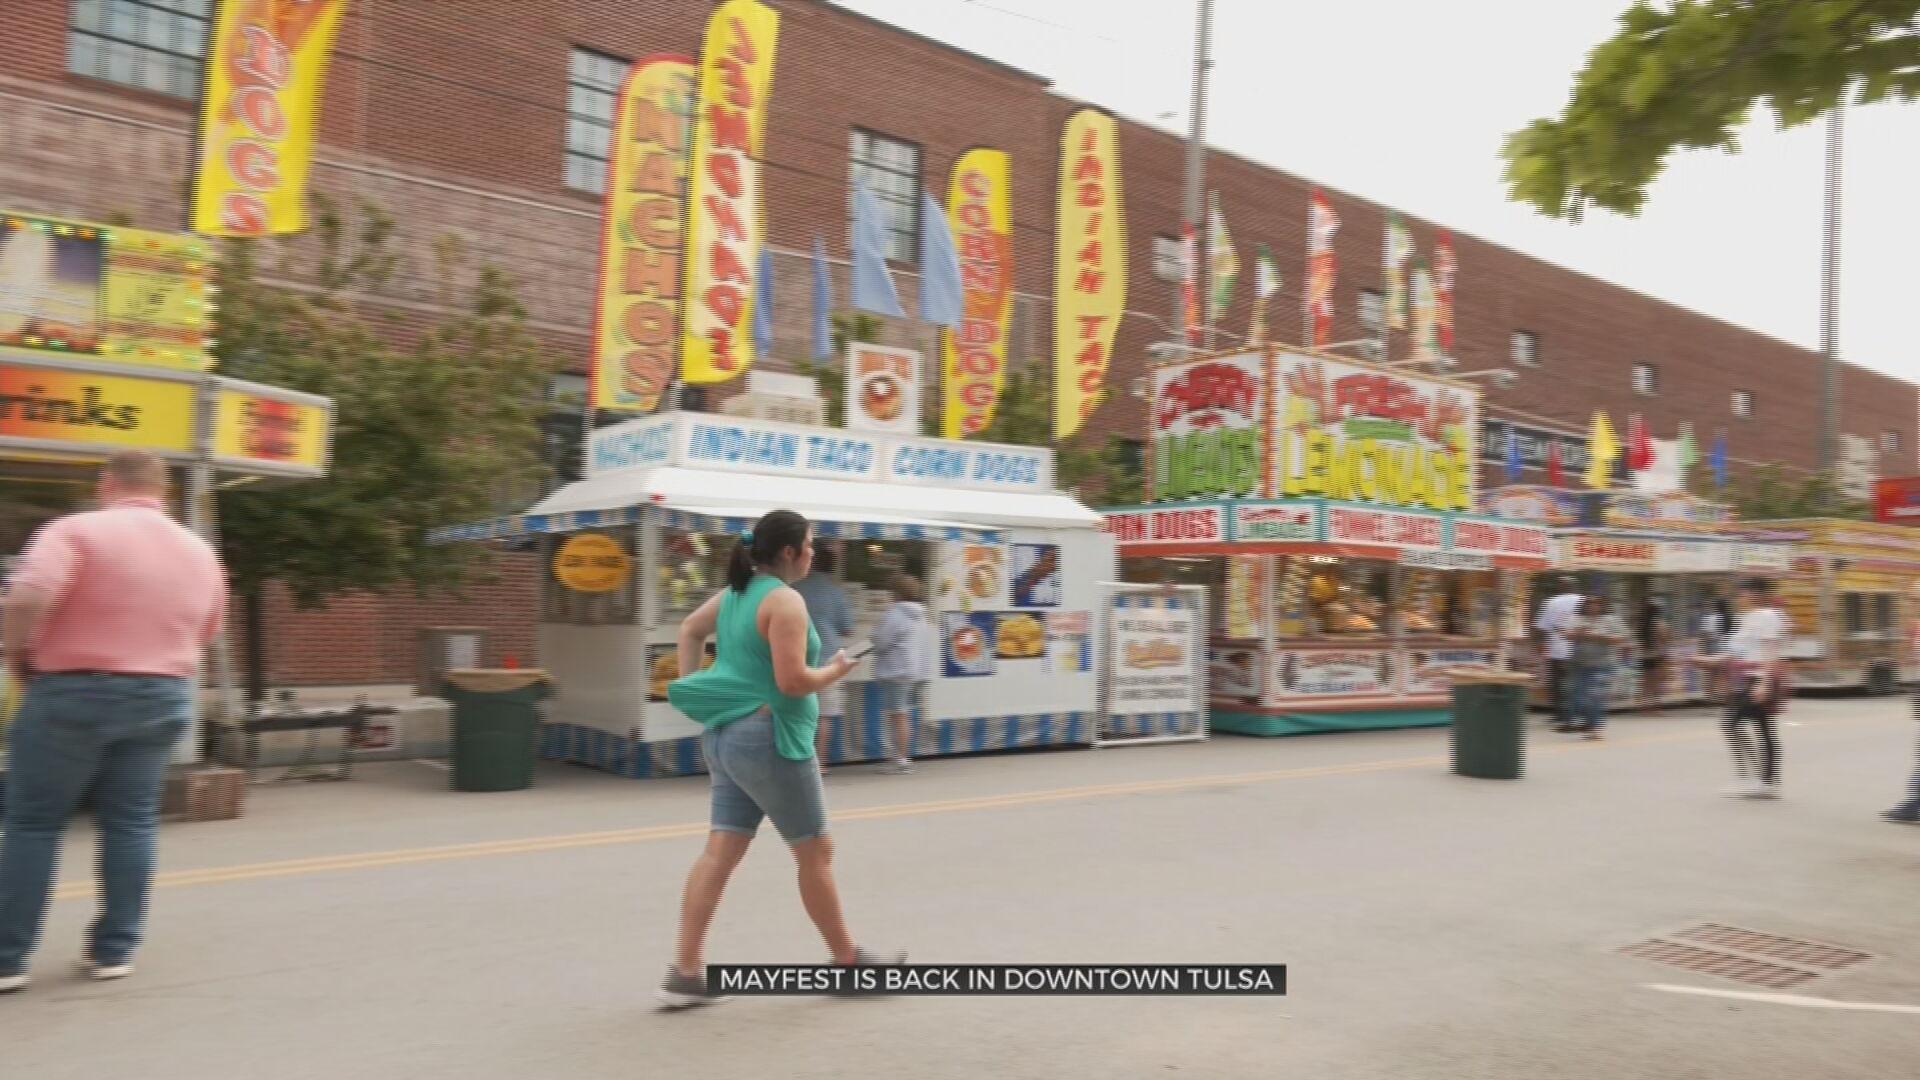 Mayfest Brings Food, Music & Fun To Downtown Tulsa